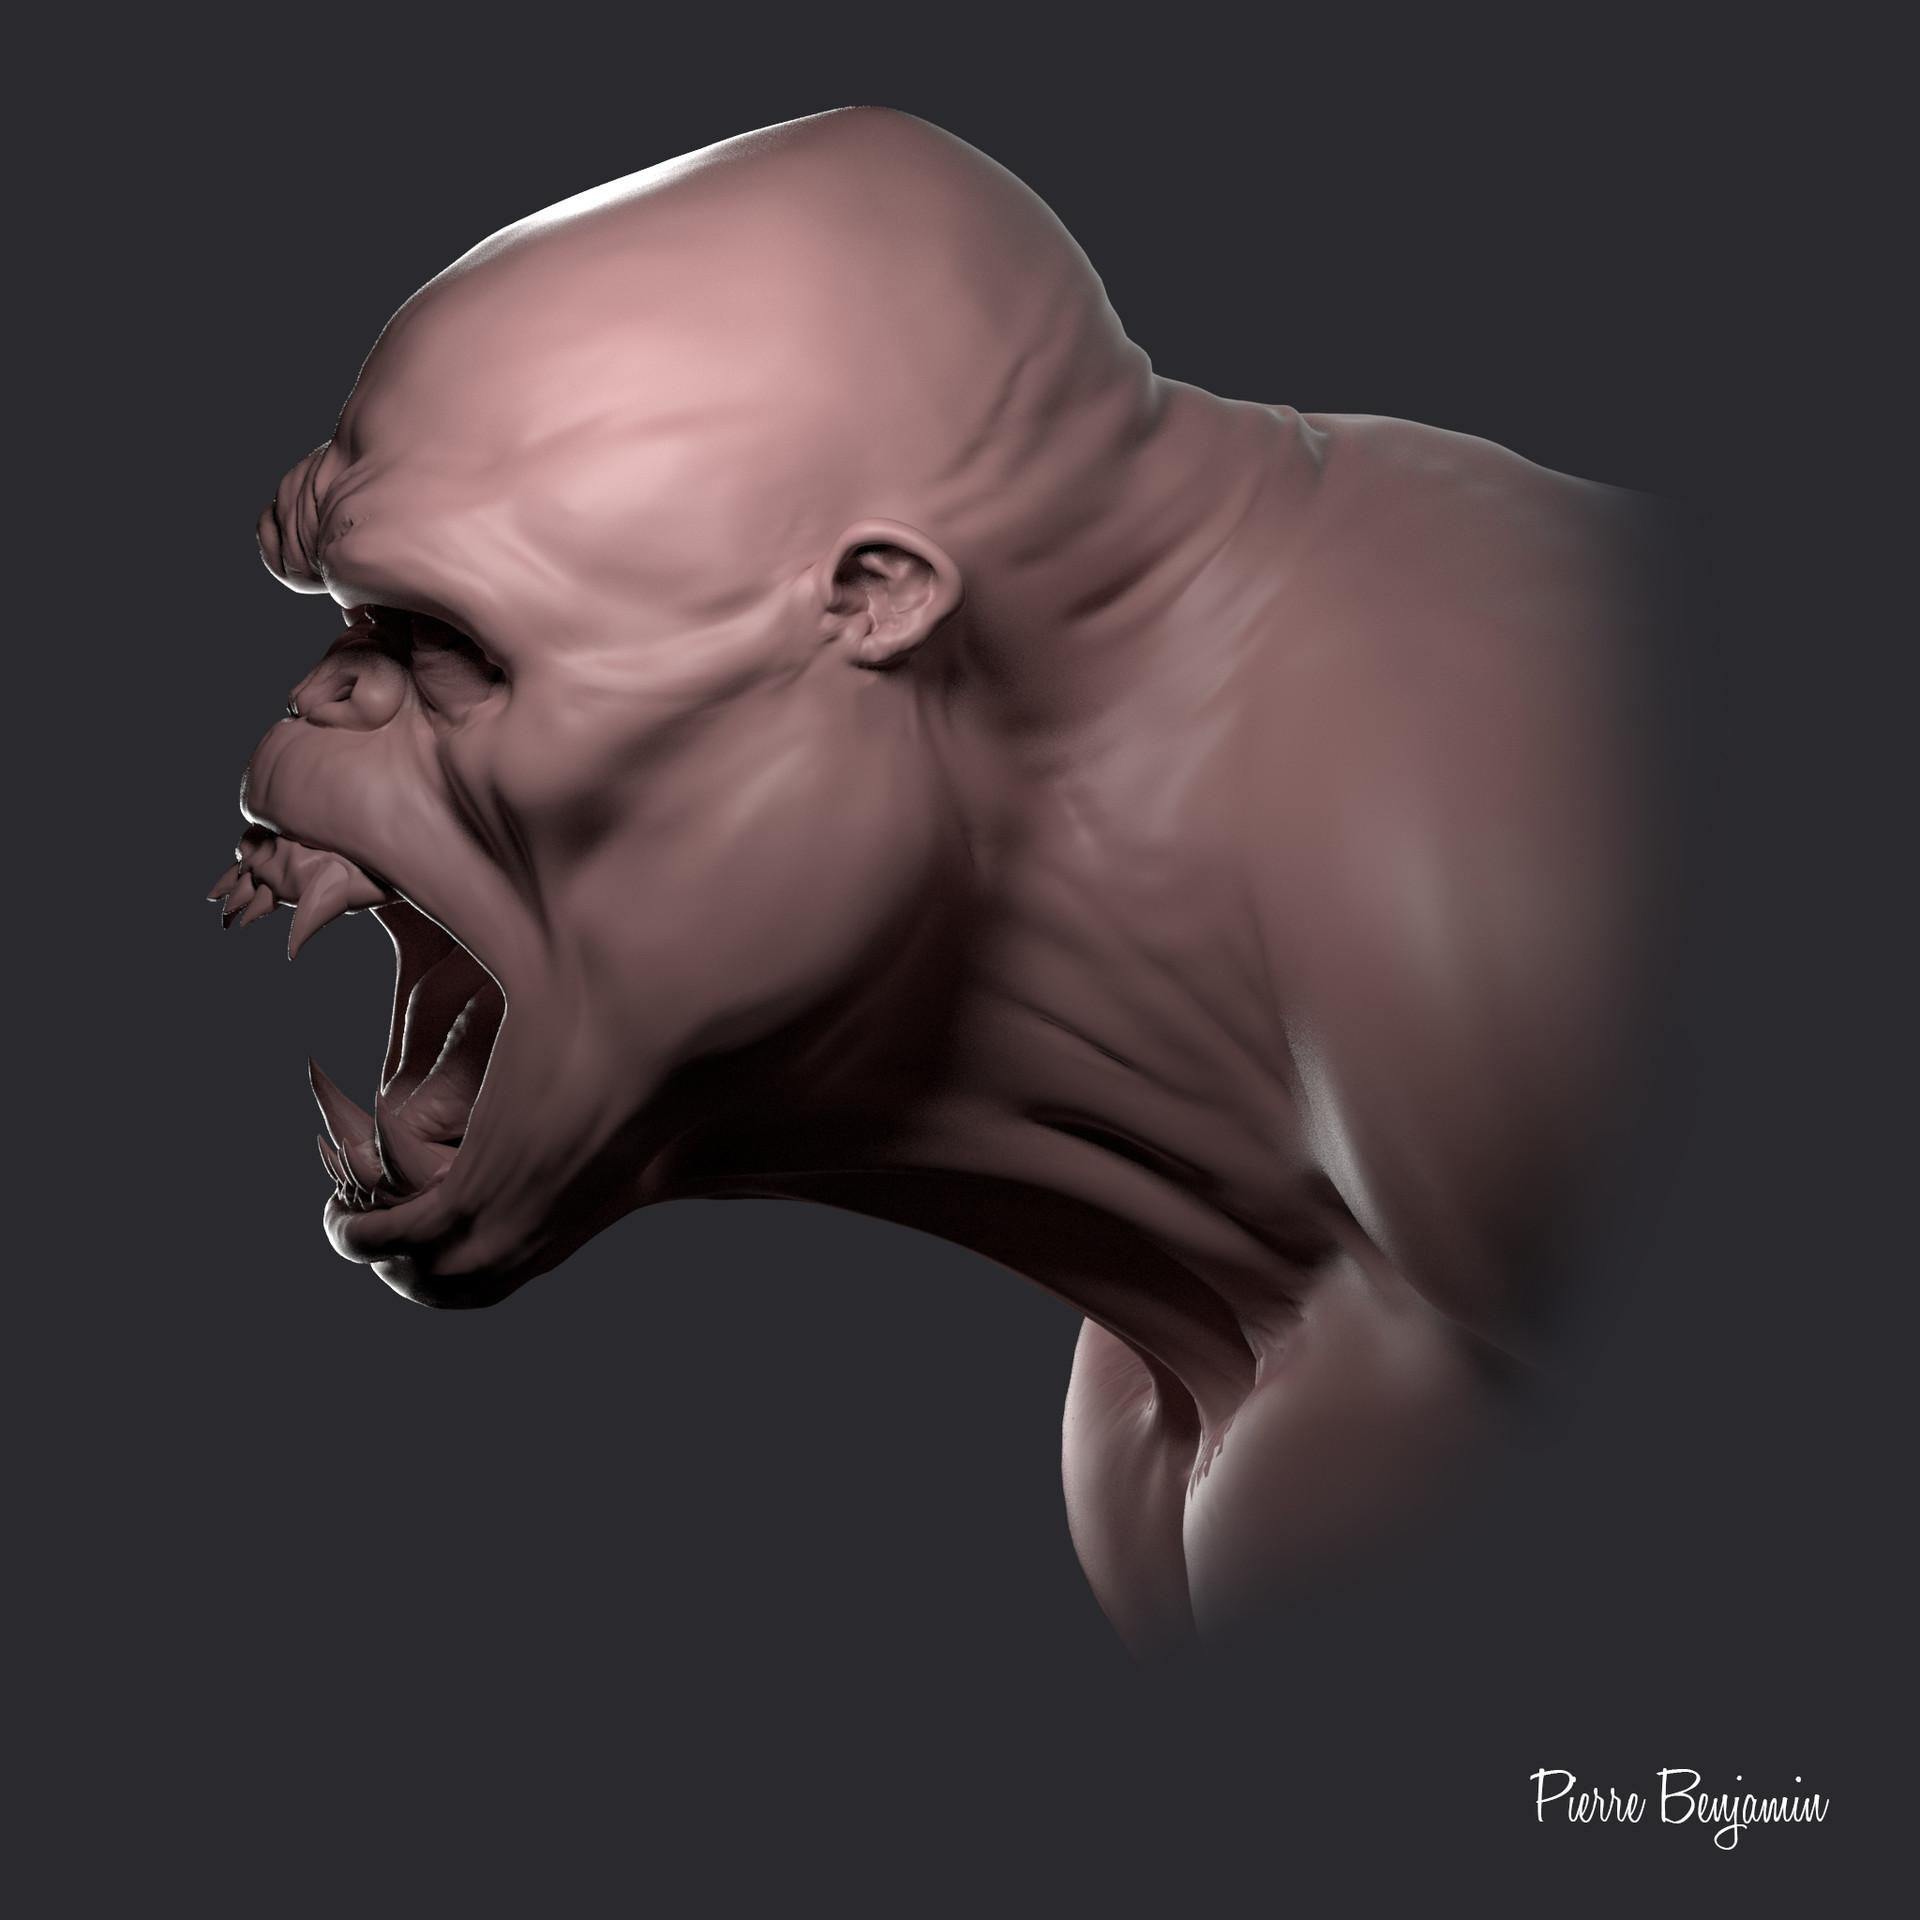 Pierre benjamin gorilla new maya arnold render ps